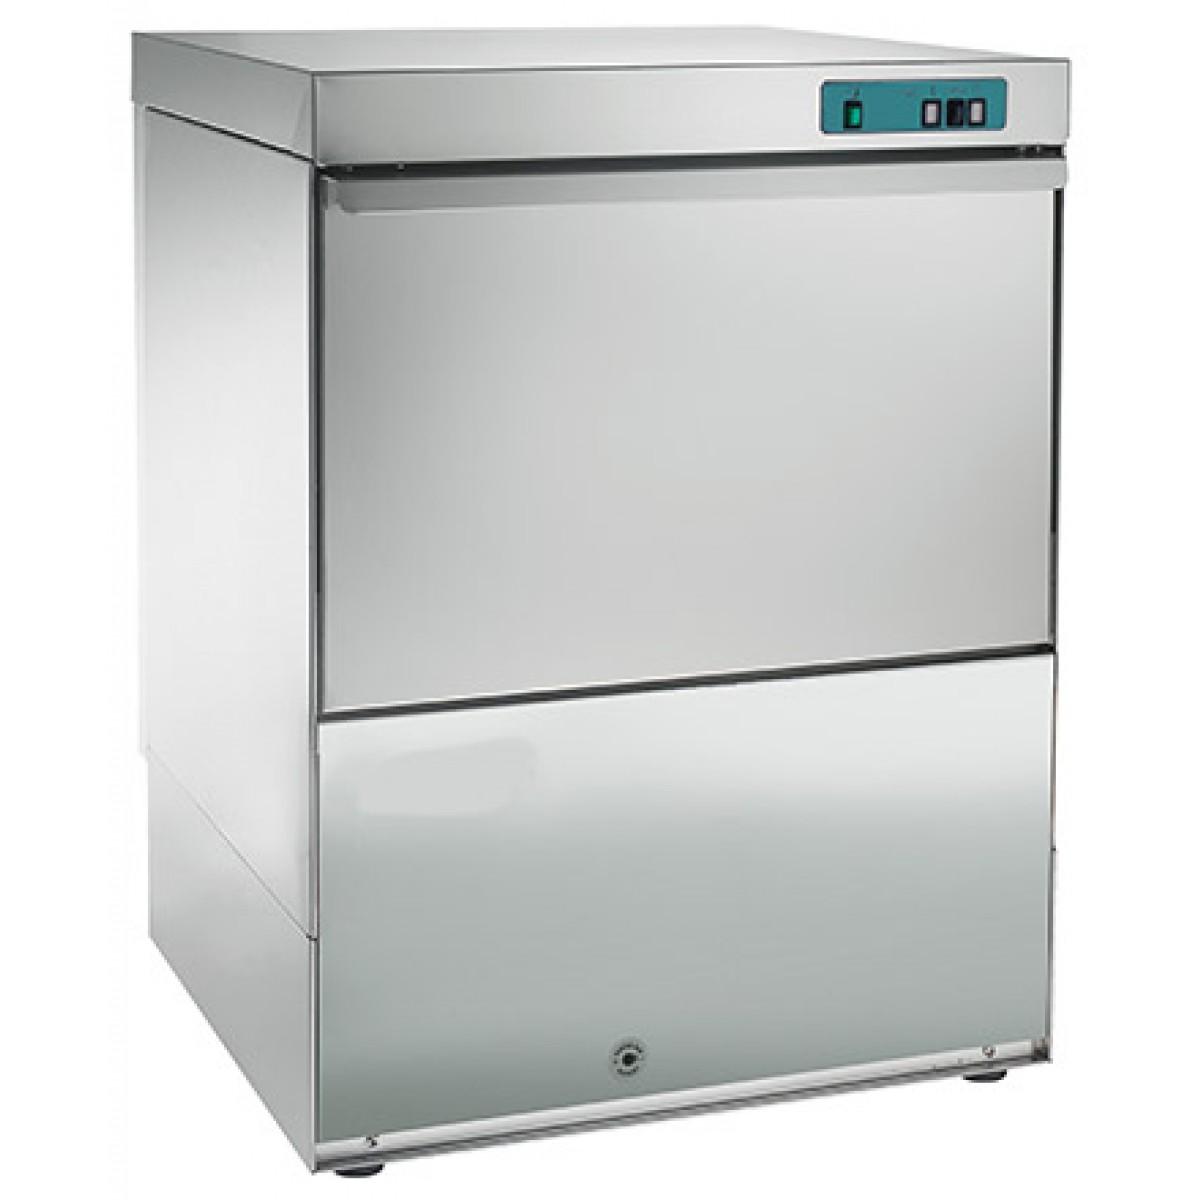 Opvaskemaskinemedindbyggetaflbspumpeogafkalker-35